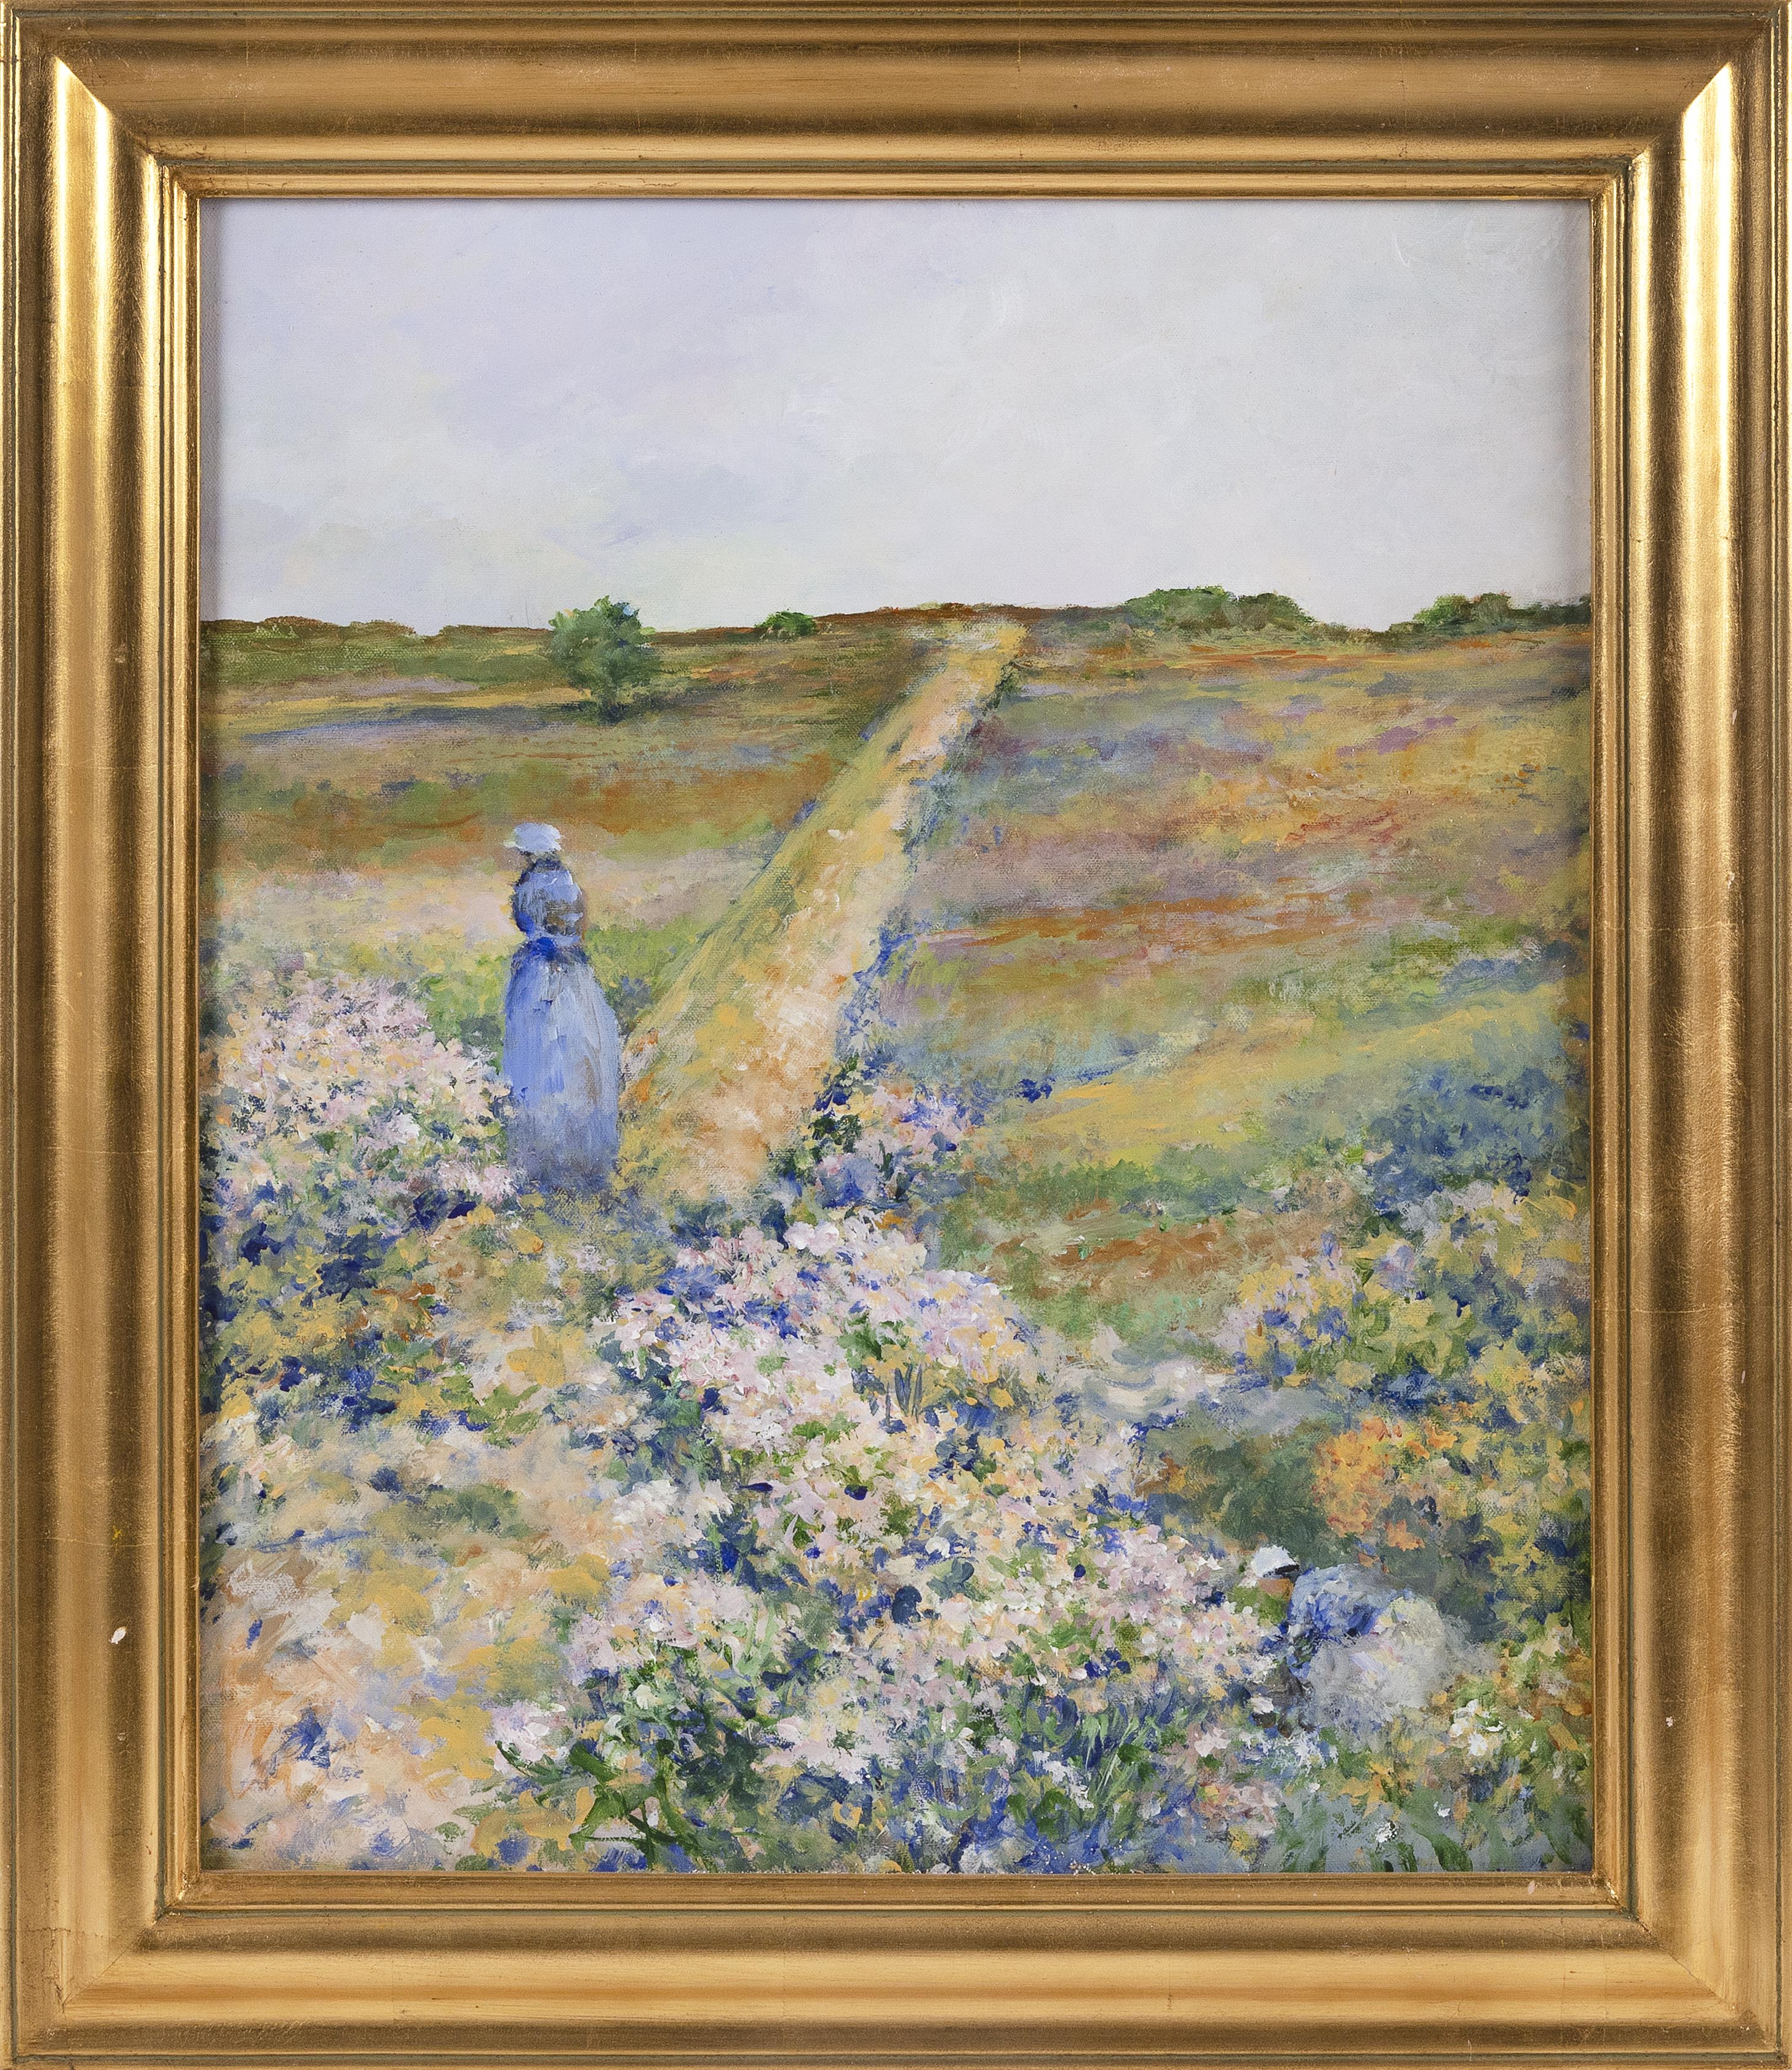 PETER GUARINO (Massachusetts, Contemporary), Path through the dunes., Acrylic on canvas, 23